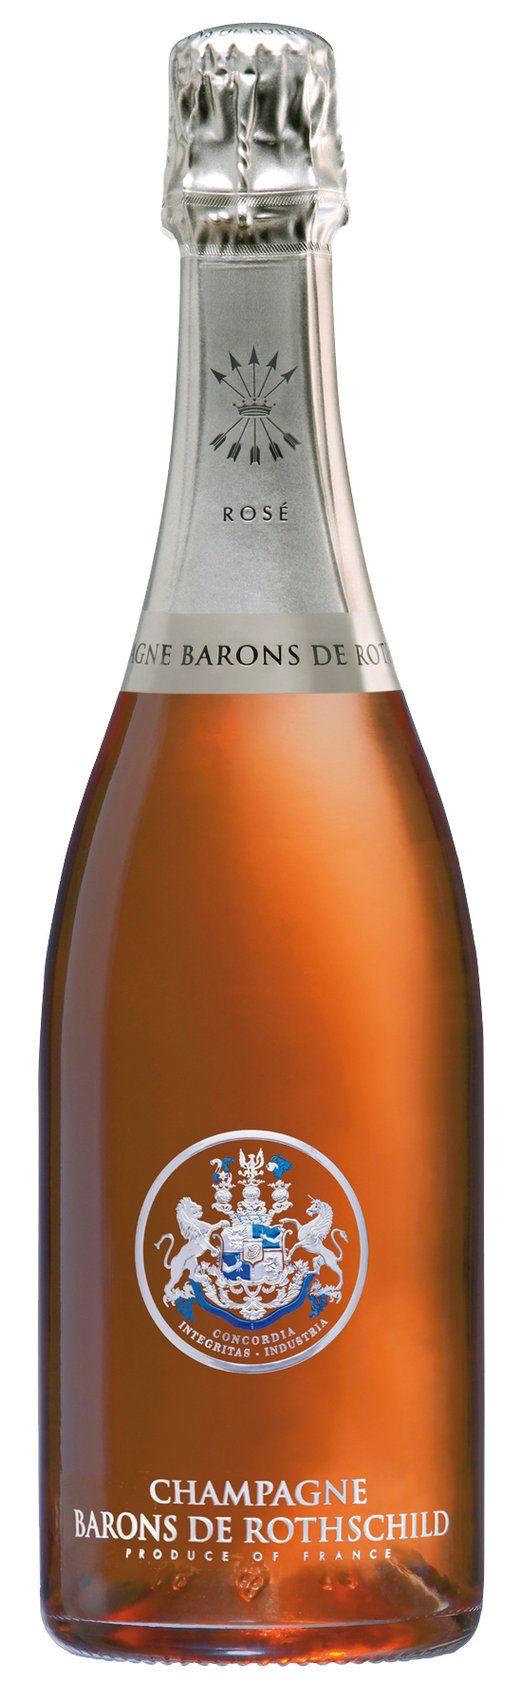 Barons de Rothschild Rose Champagne